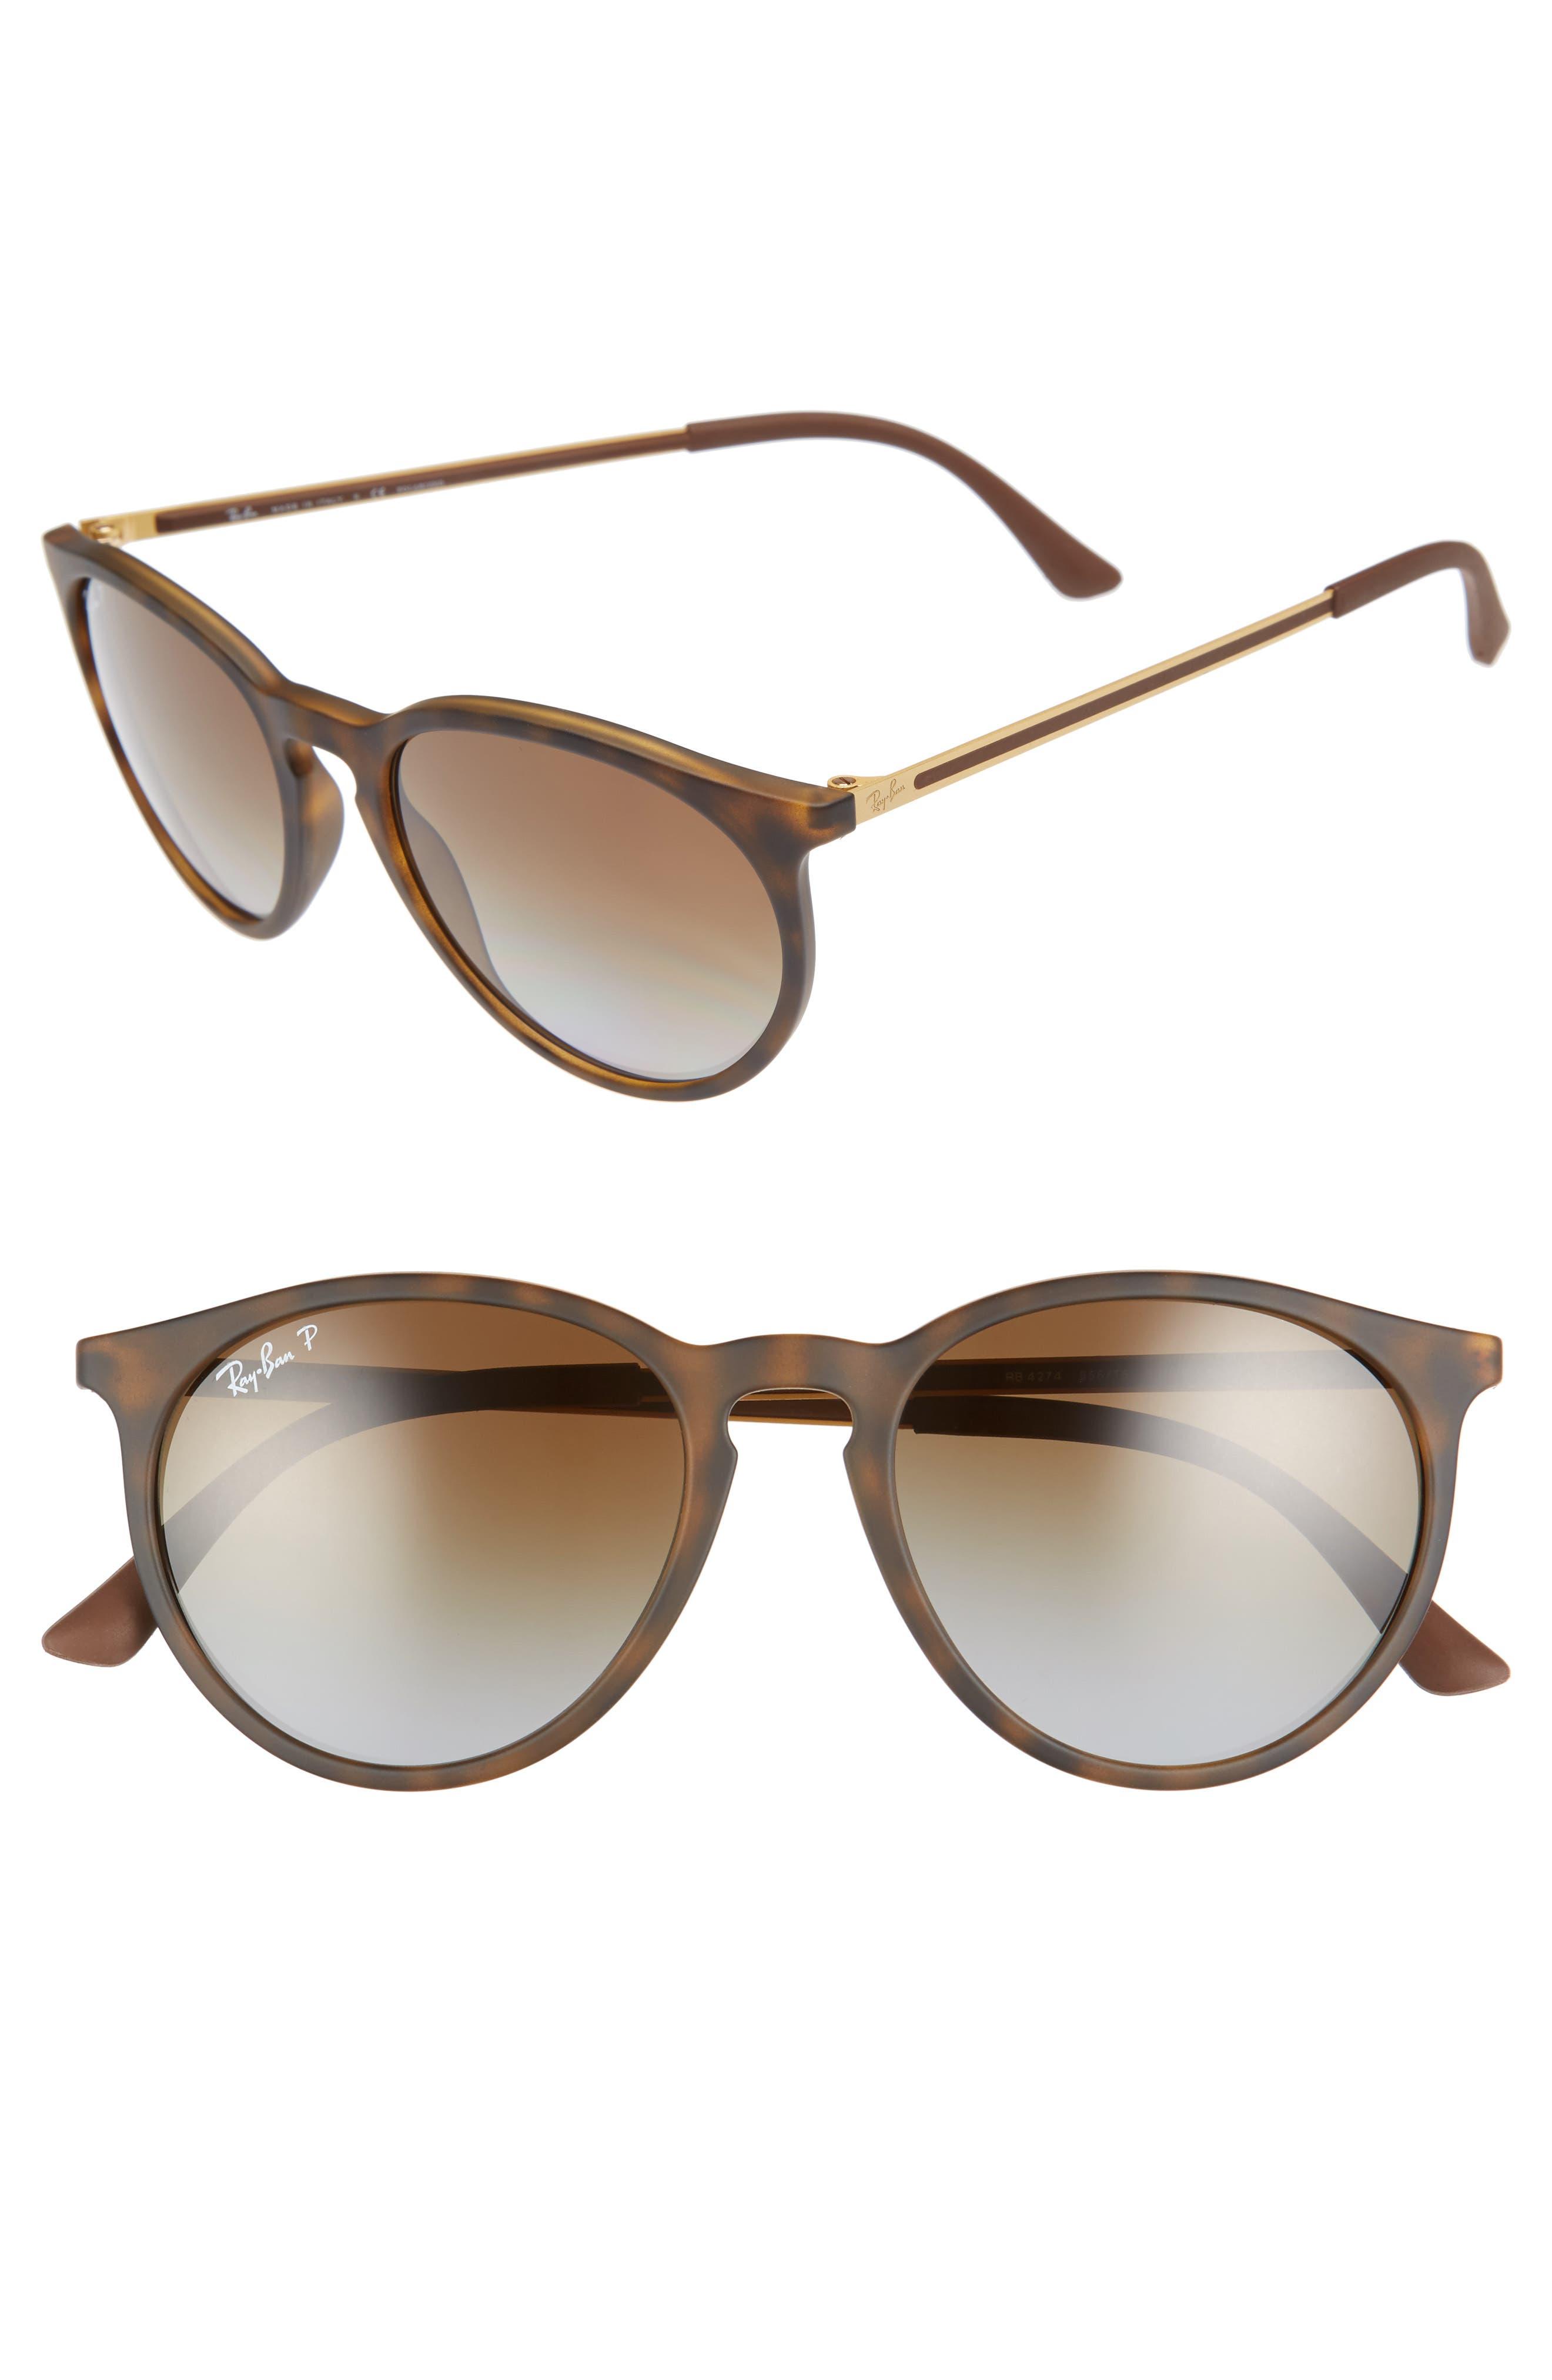 Ray-Ban 5m Polarized Round Sunglasses -